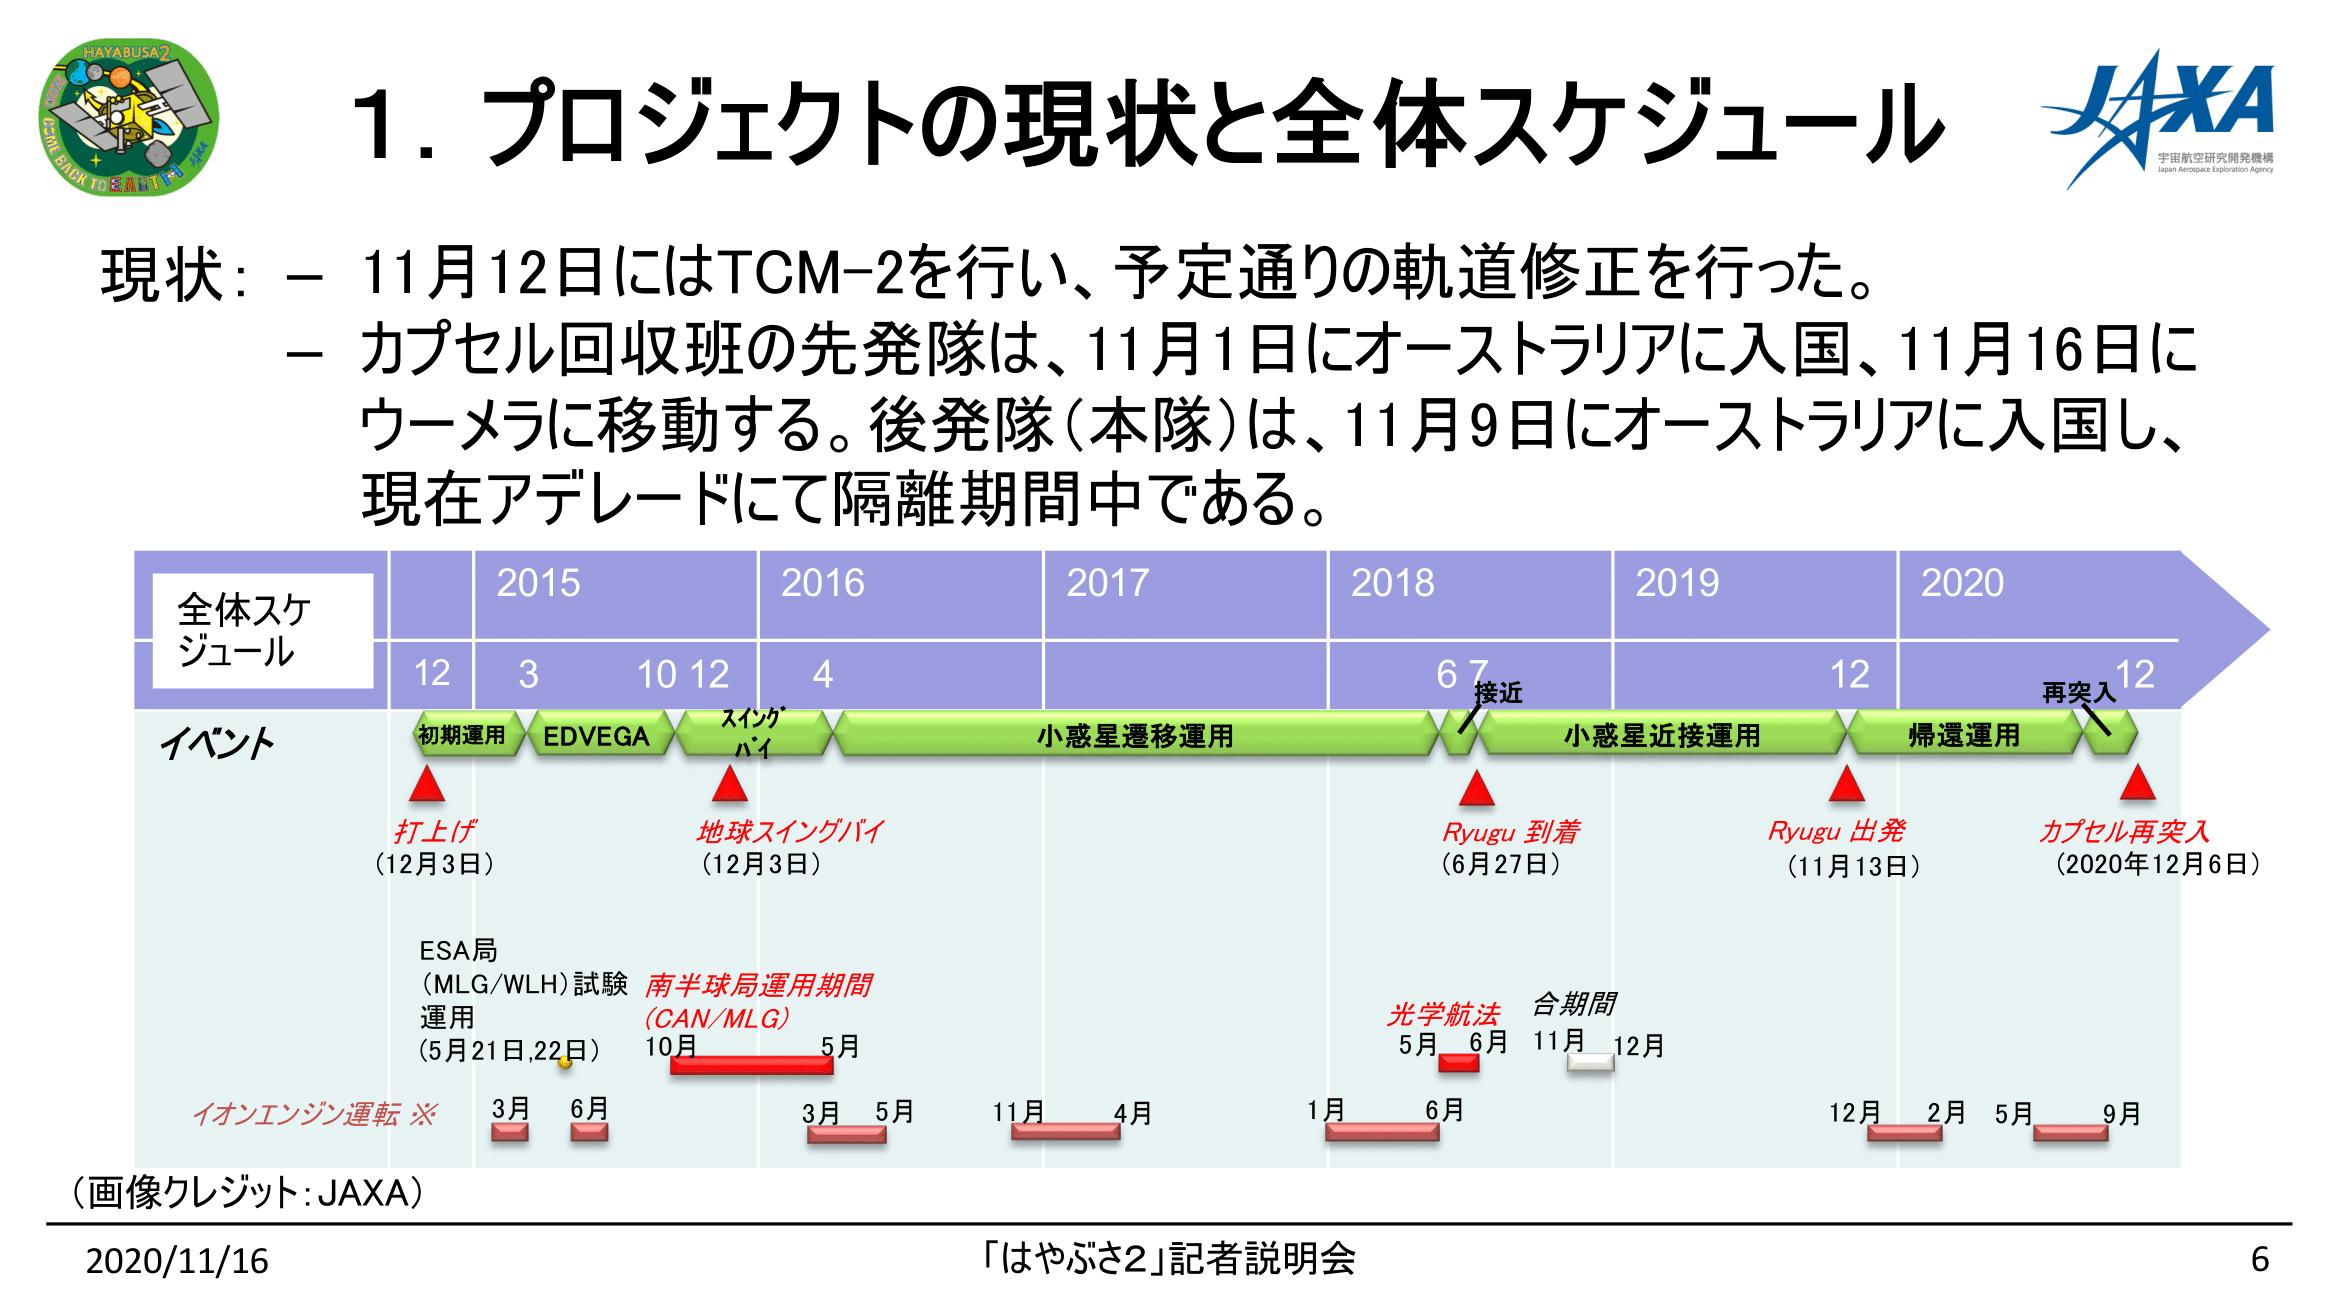 f:id:Imamura:20201116151133p:plain